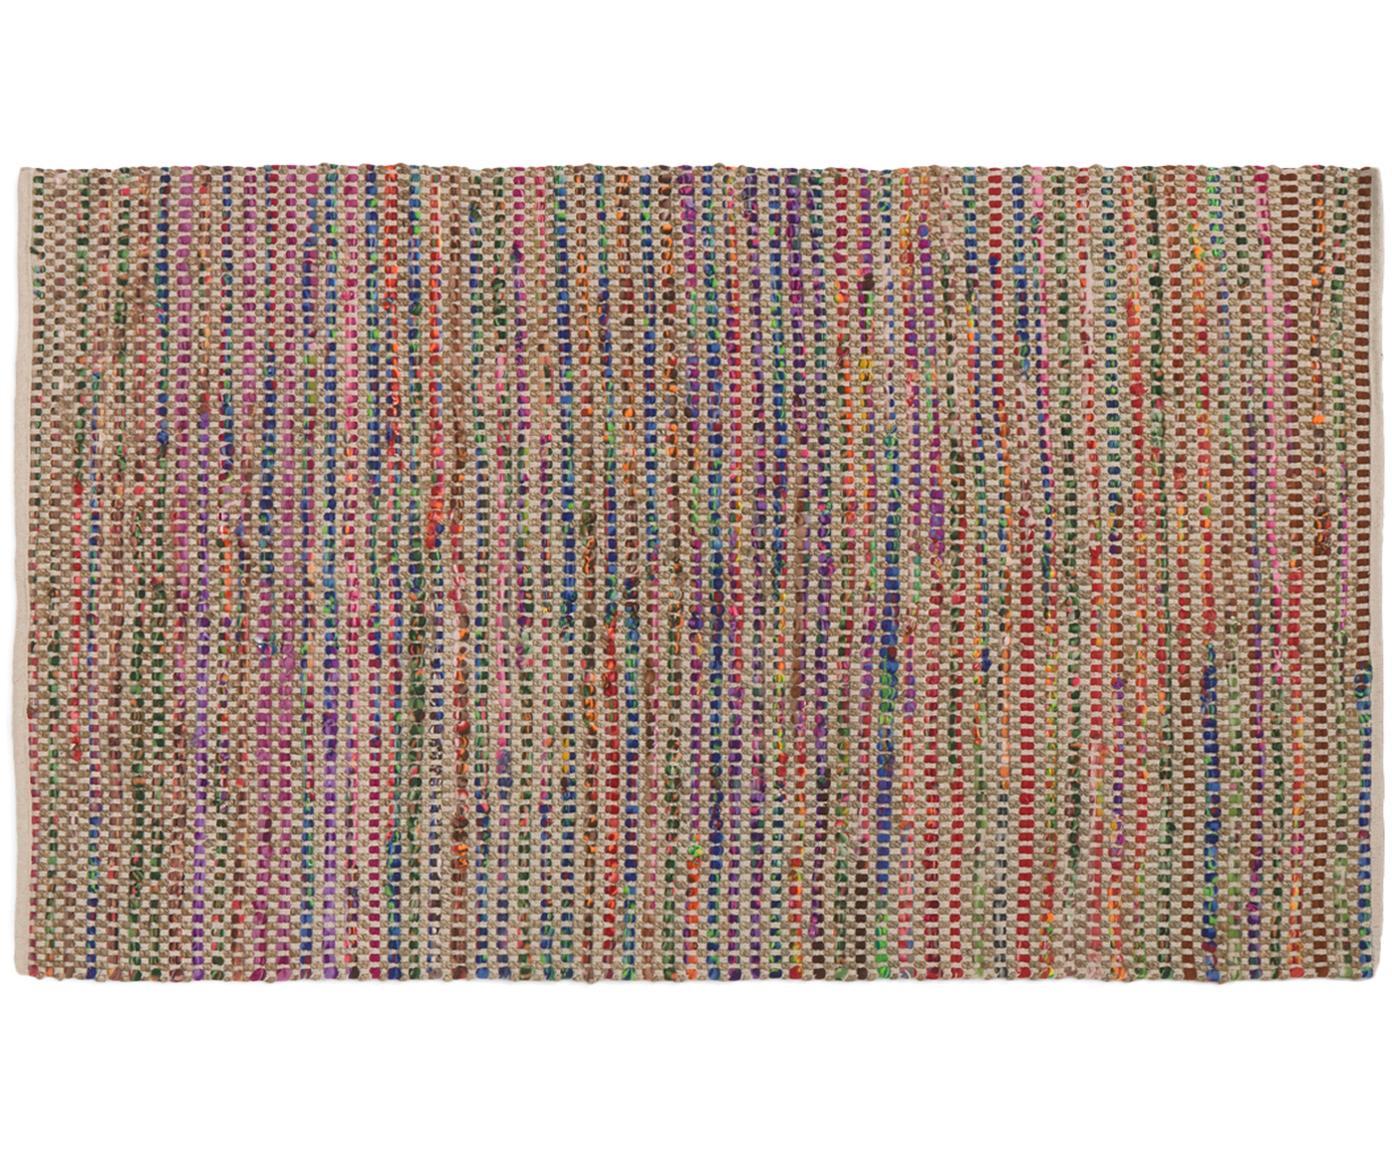 Vloerkleed Cando, 60% synthetische Fasern, 40% jute, Jute, multicolour, B 60 x L 90 cm (maat XXS)